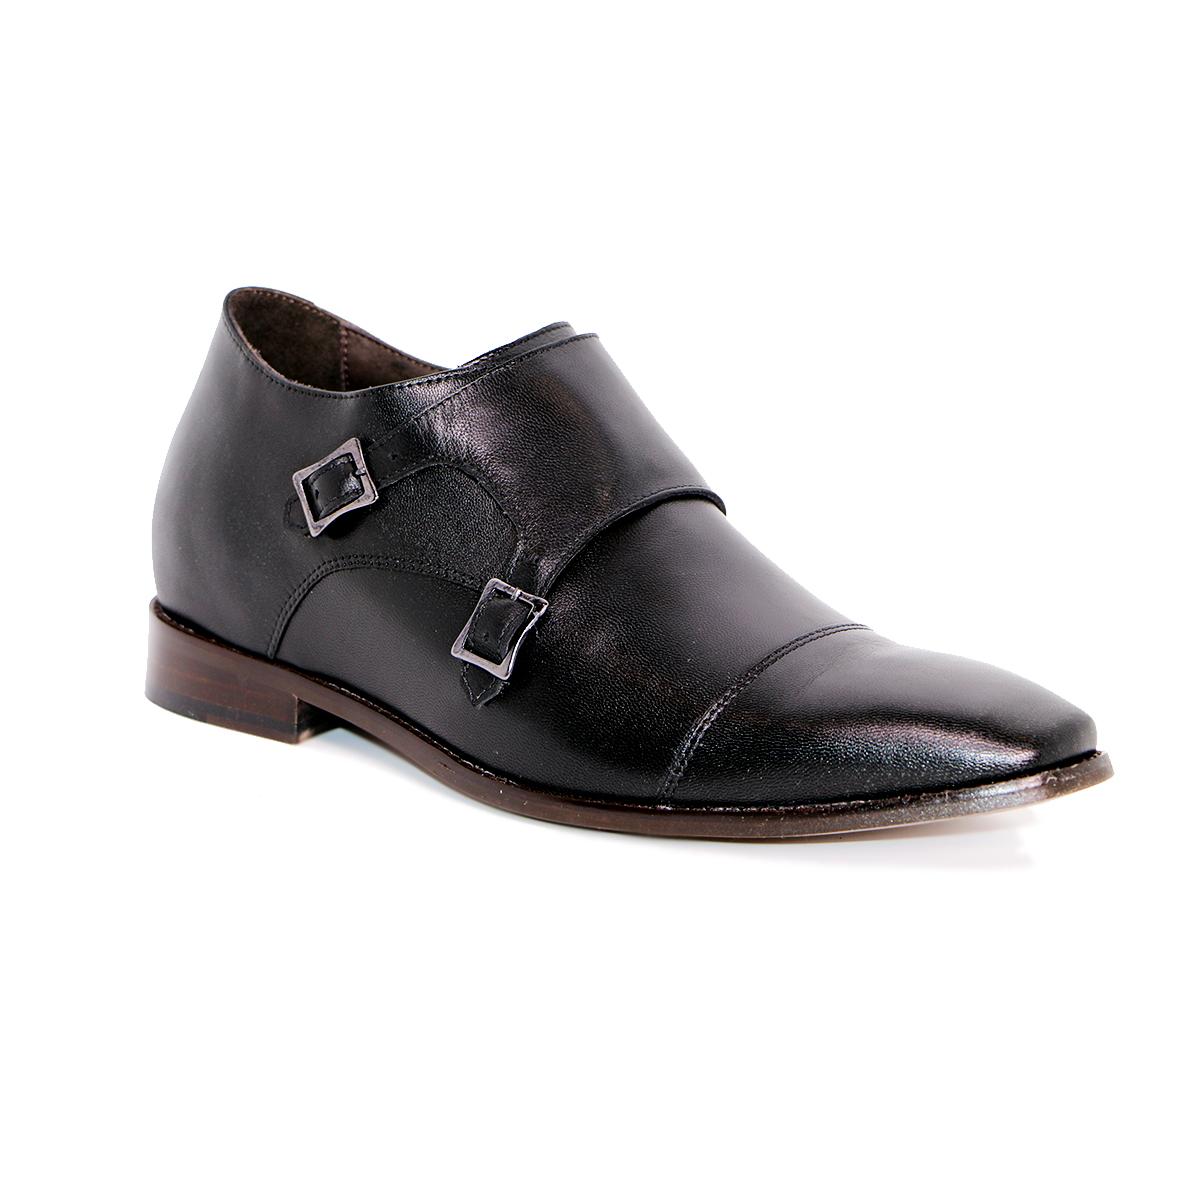 Zapato Formal Lawyers Negro Max Denegri +7cms de Altura_72934